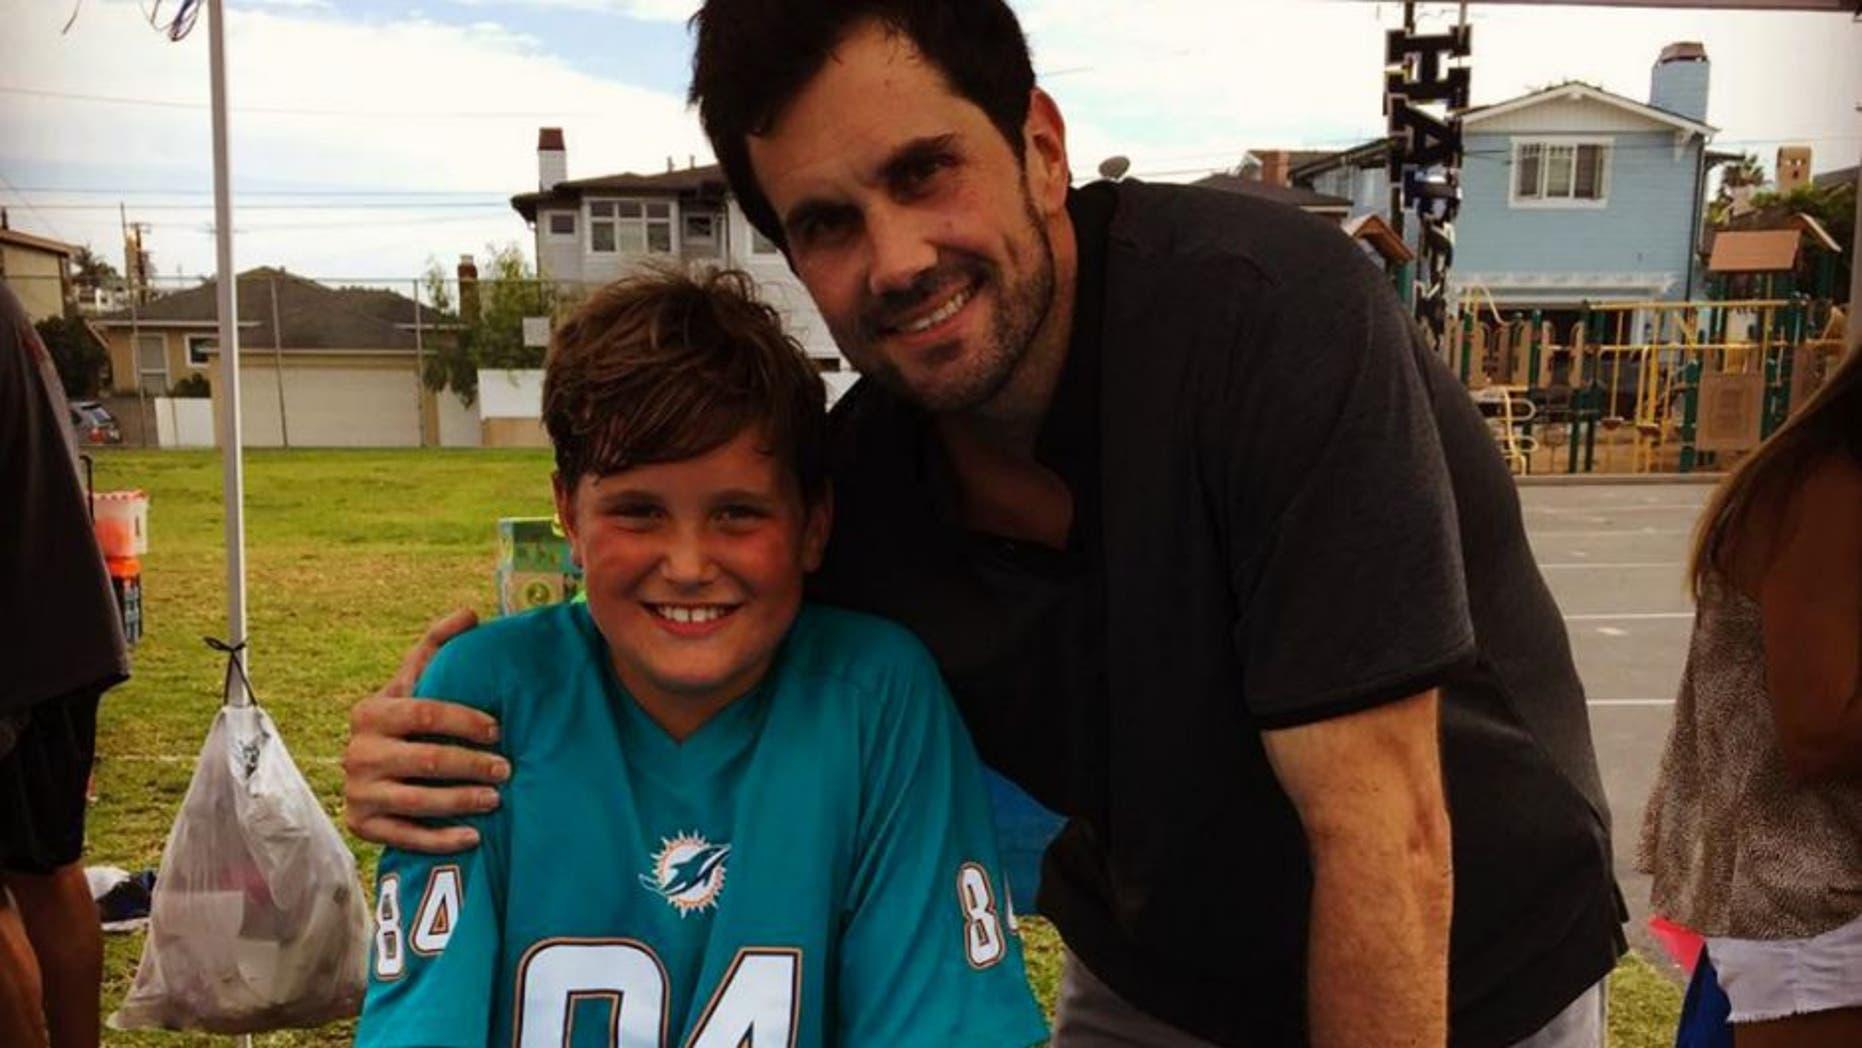 Matt Leinart showed off his son Cole's football talents in an impressive video.